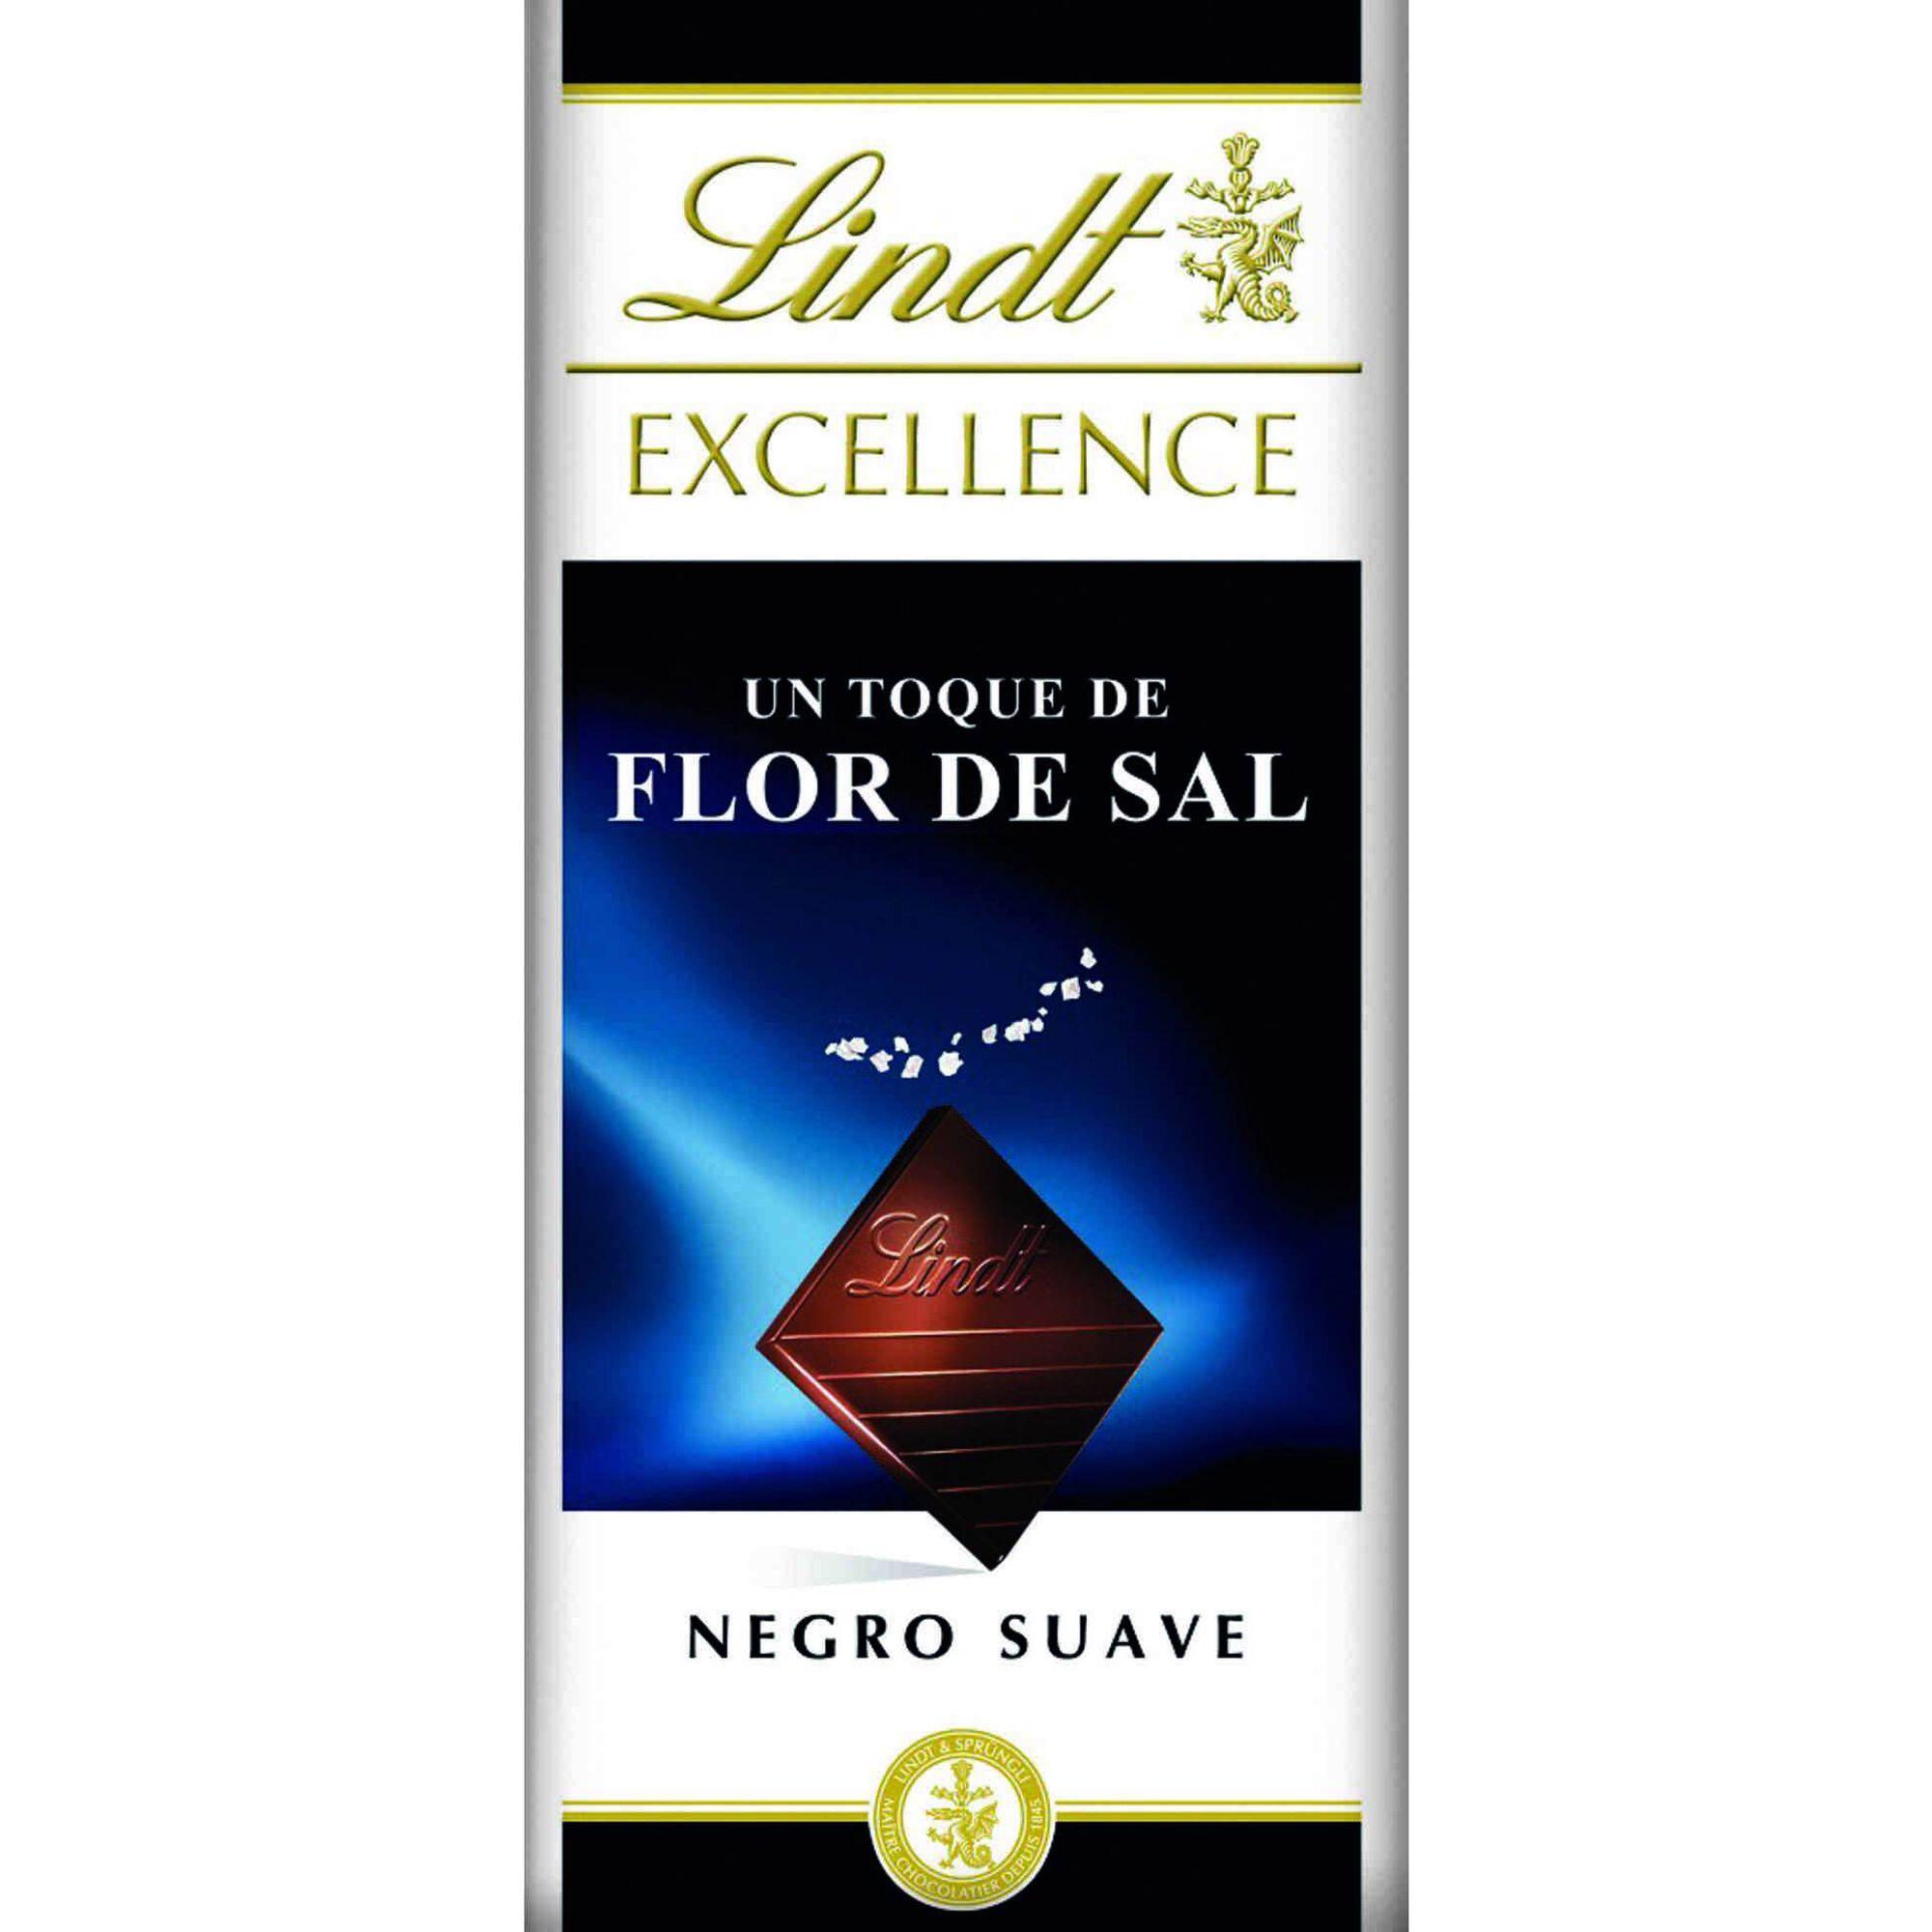 Tablete de Chocolate Negro com Flor de Sal Excellence